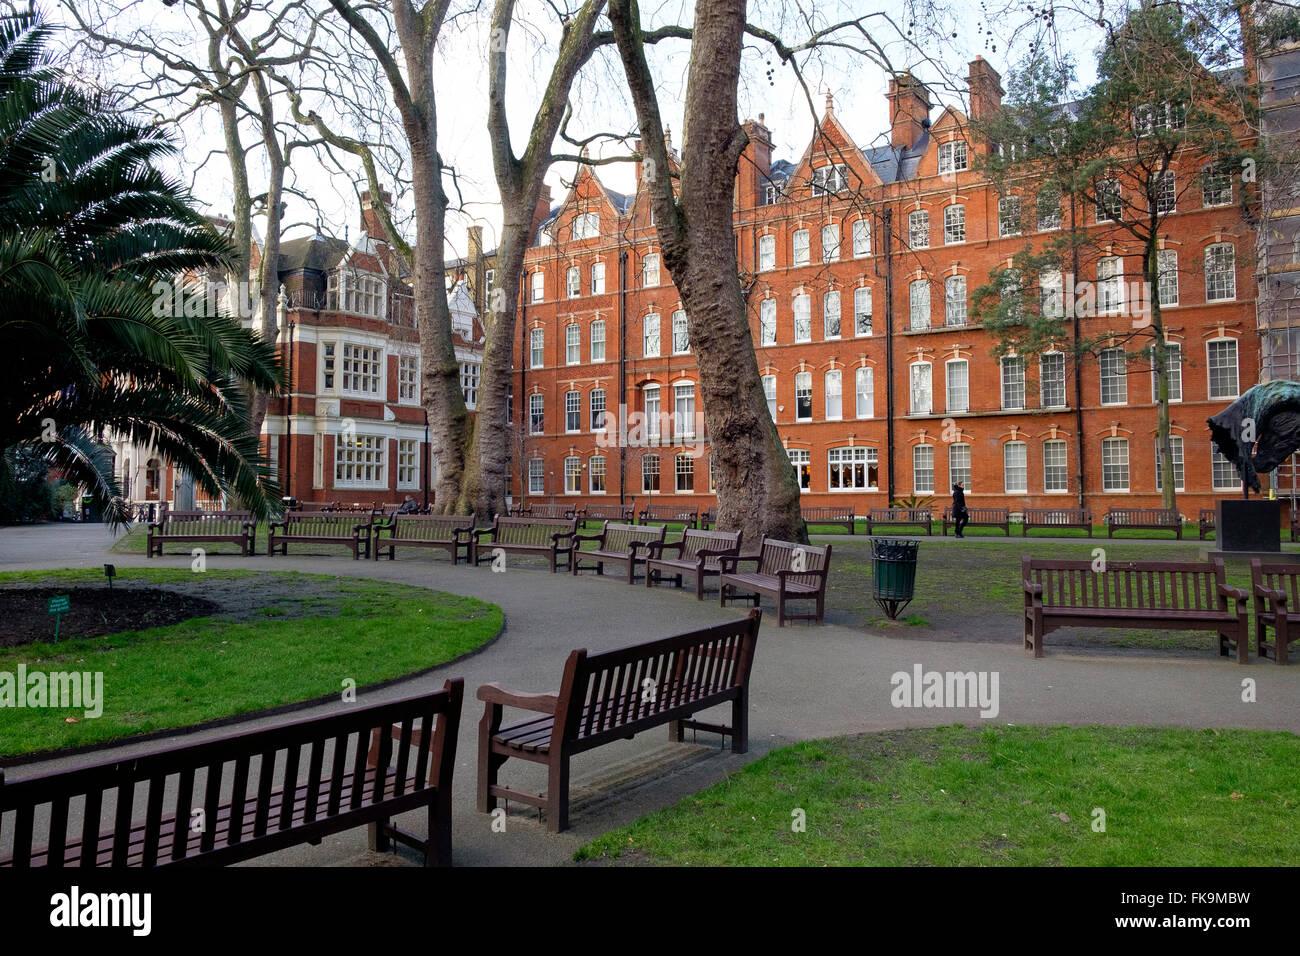 London, UK - 24 February 2016: Mount Street Gardens - a public garden in the heart of Mayfair - Stock Image